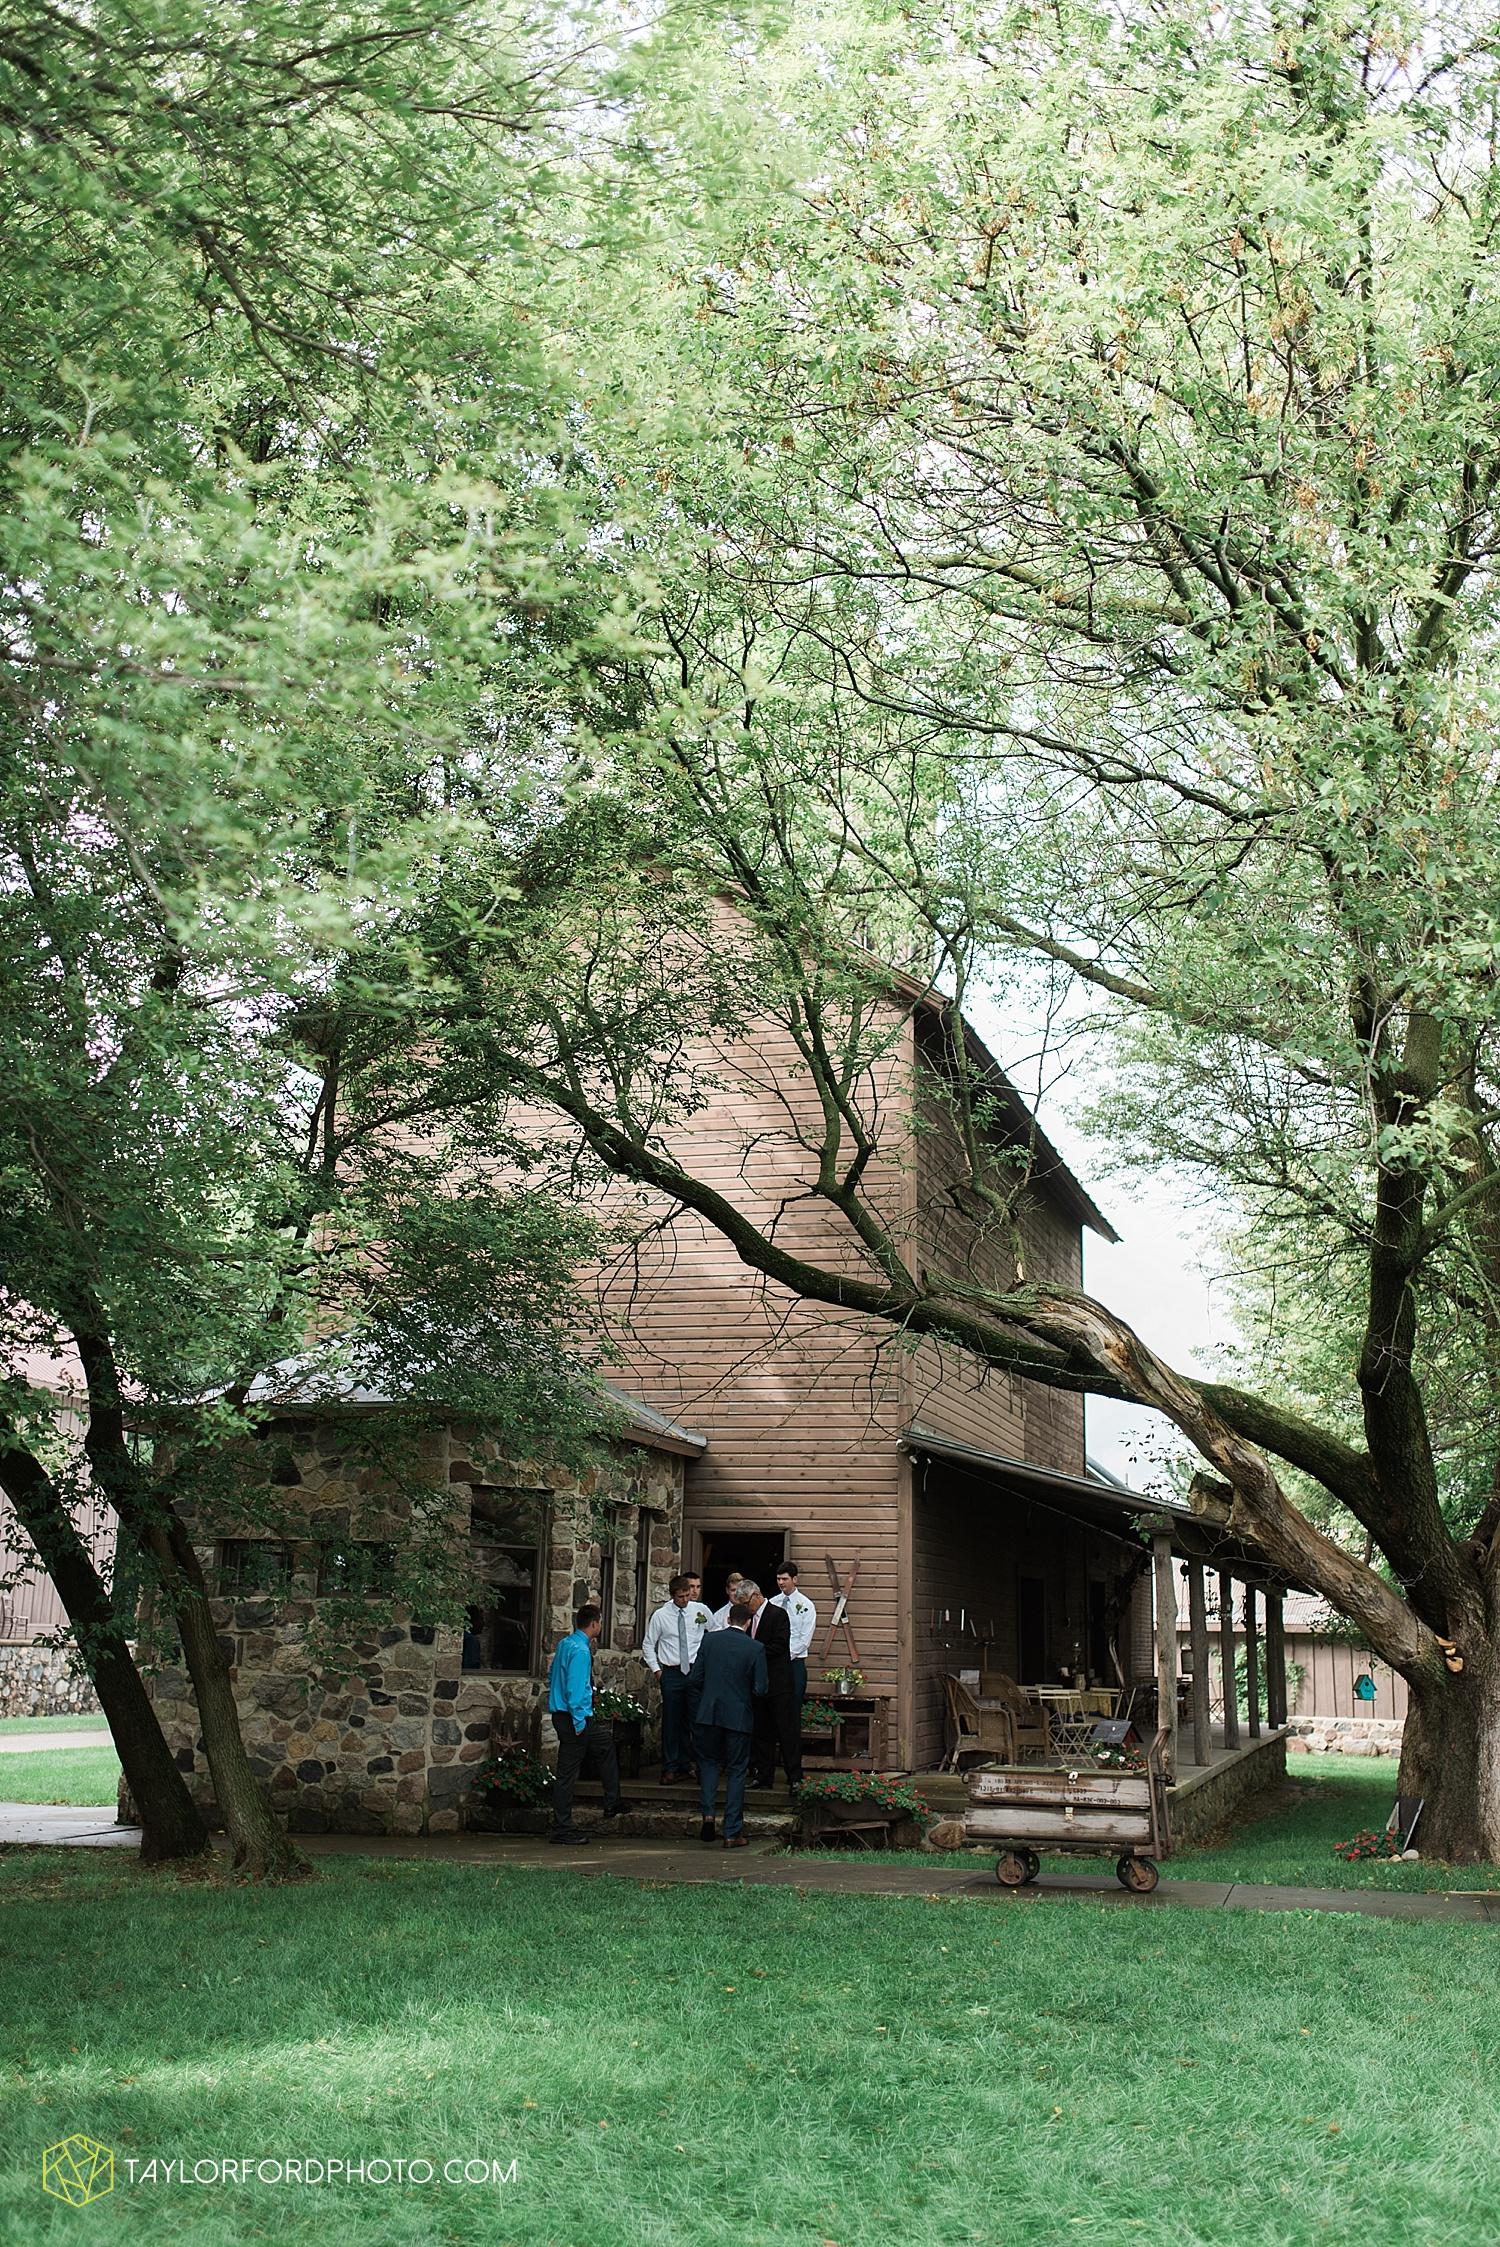 fort_wayne_indiana_van_wert_columbus_ohio_nashville_tennessee_photographer_taylor_ford_shoppes_at_old_mill_wedding_0727.jpg